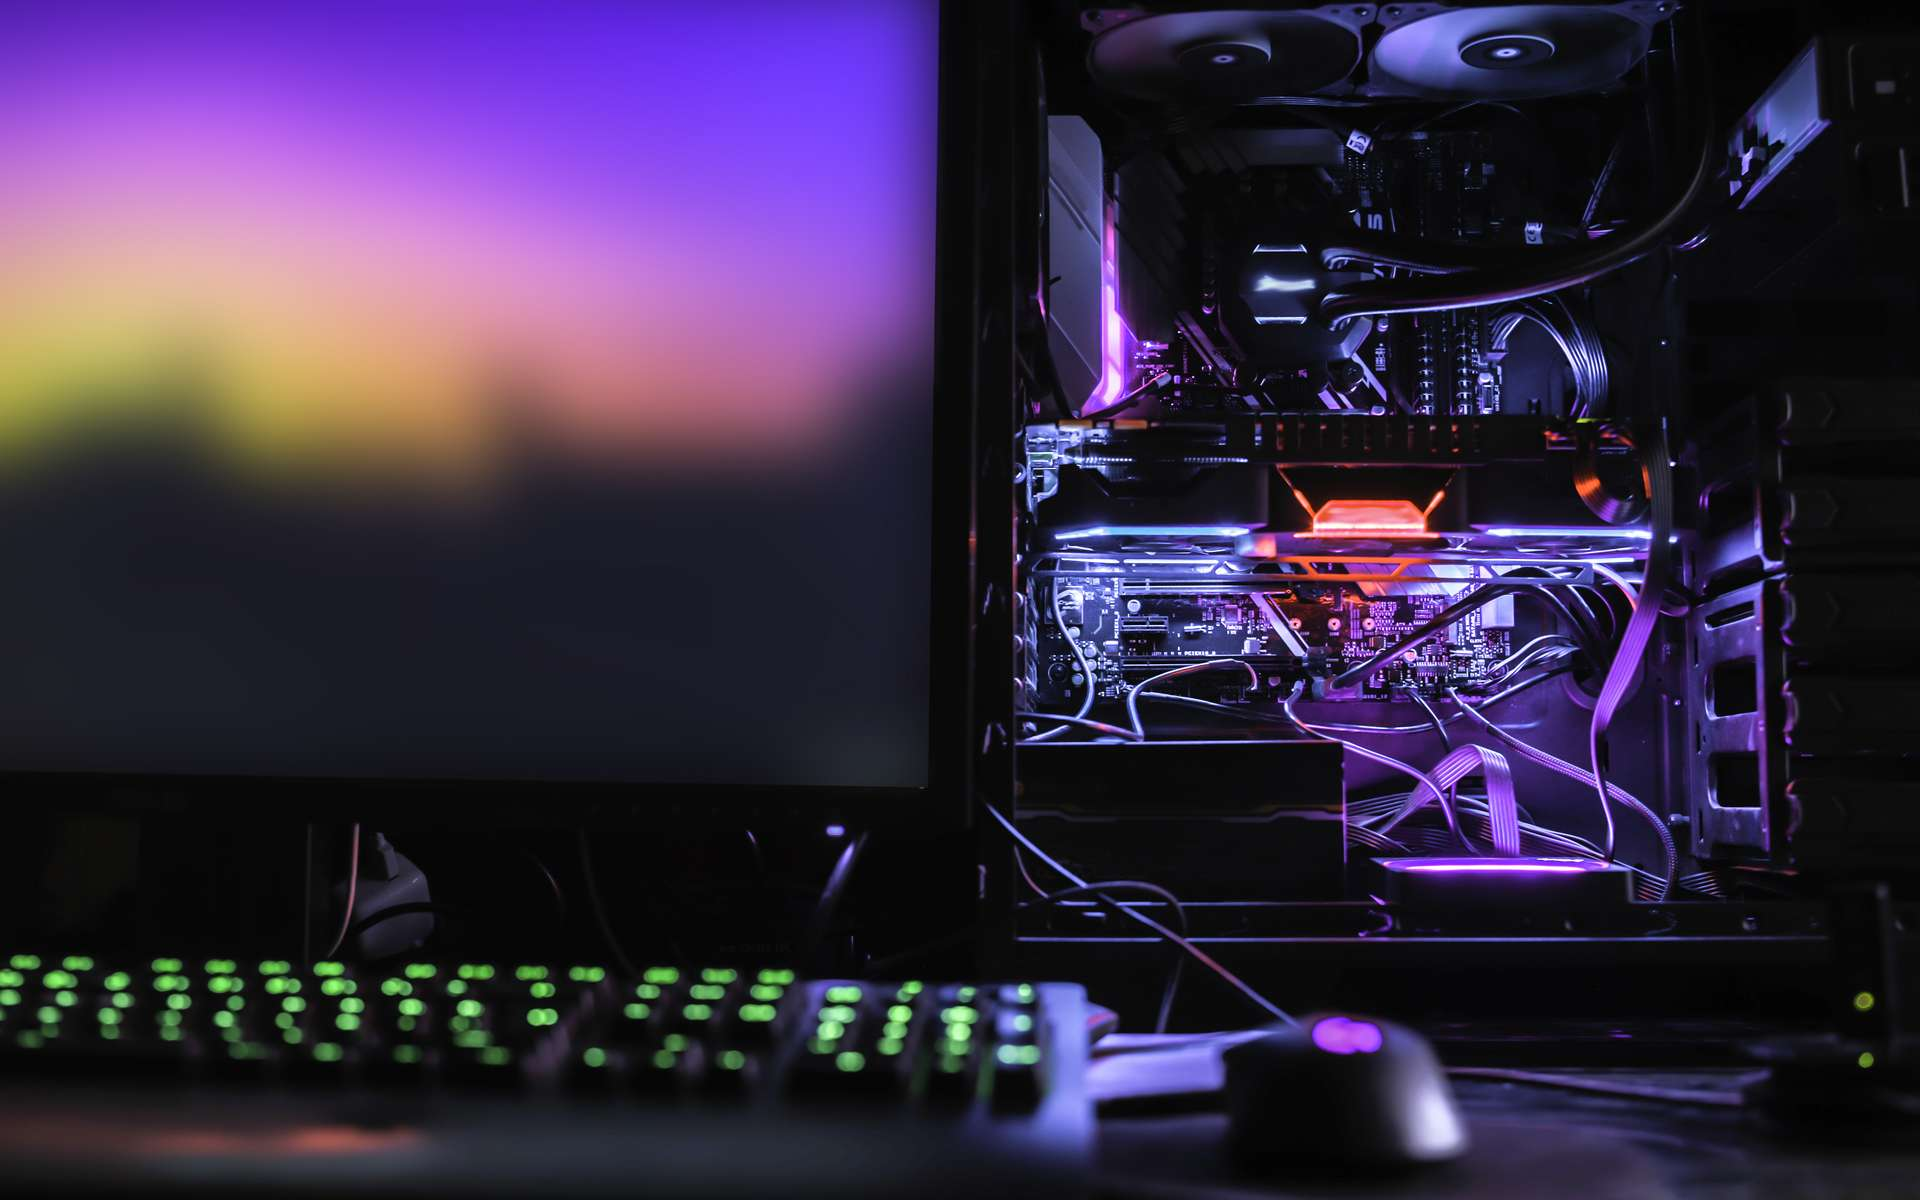 Un PC gamer personnalisé. © filiz, Adobe Stock